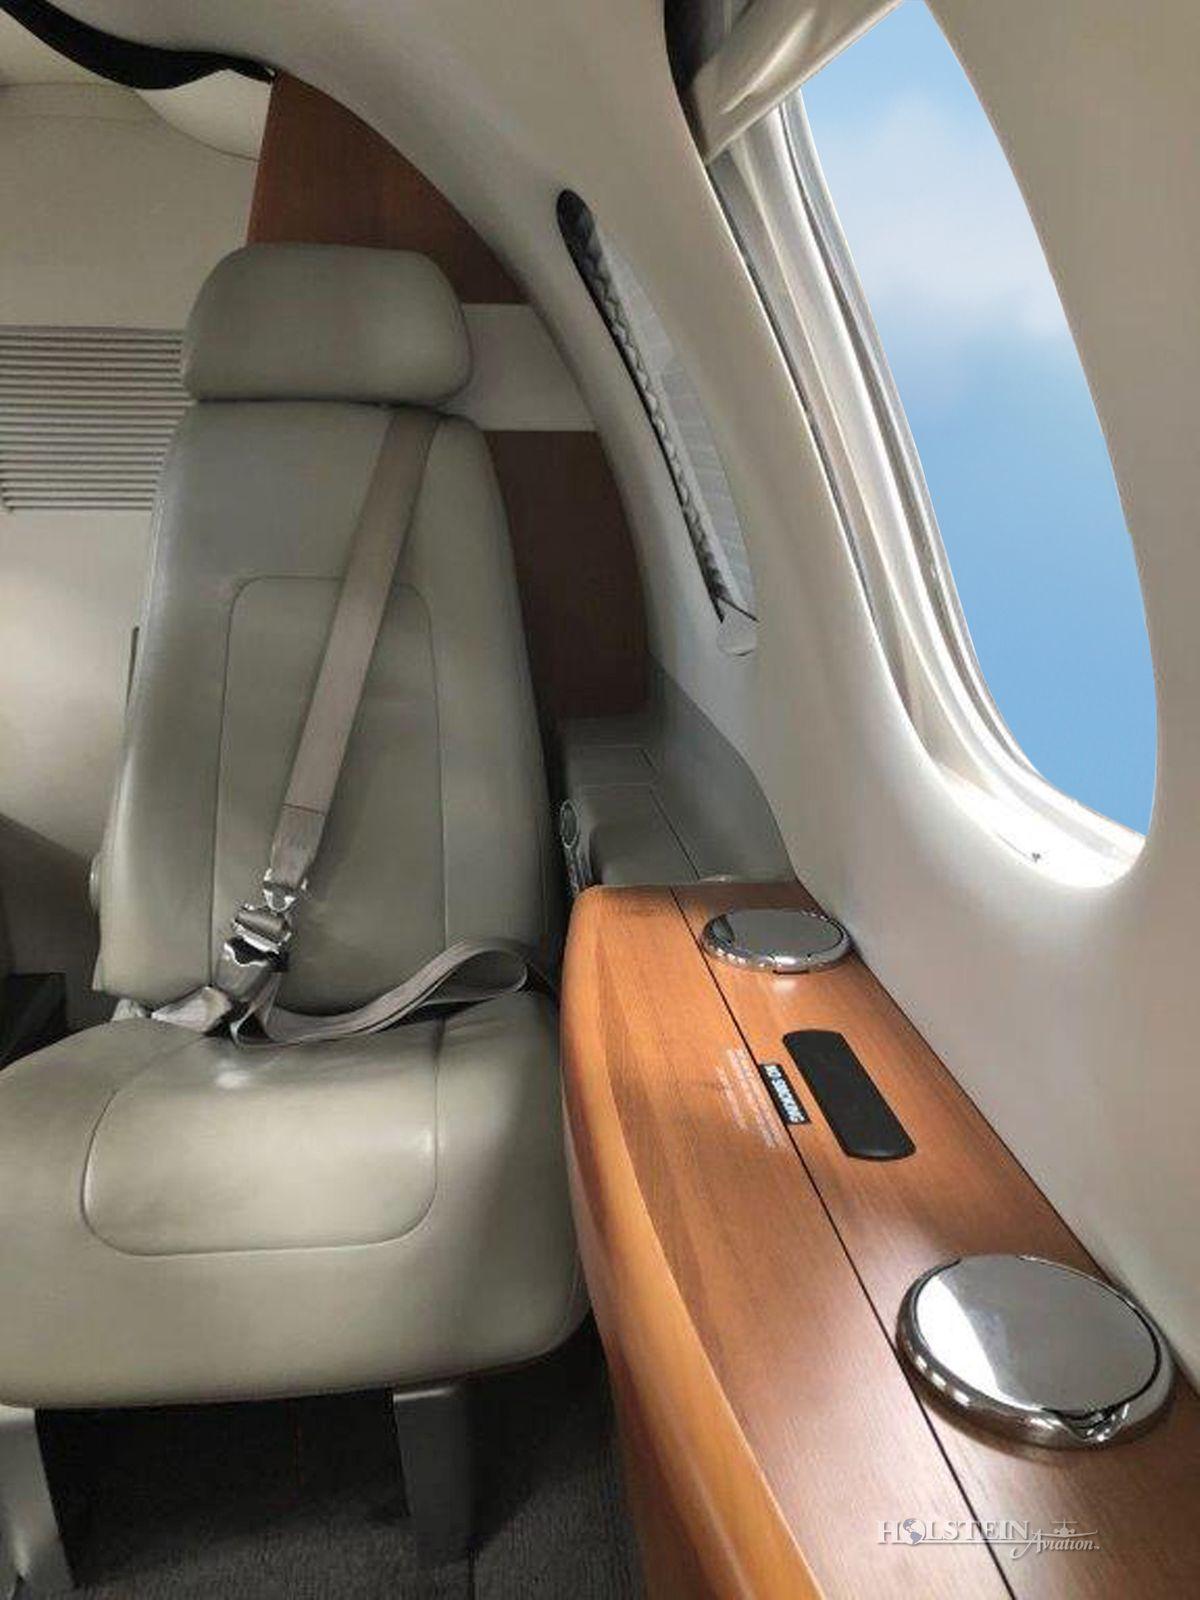 2011 Embraer Phenom 100 - SN 50000237 - VH-FJP - Int - Seat CU RGB.jpg